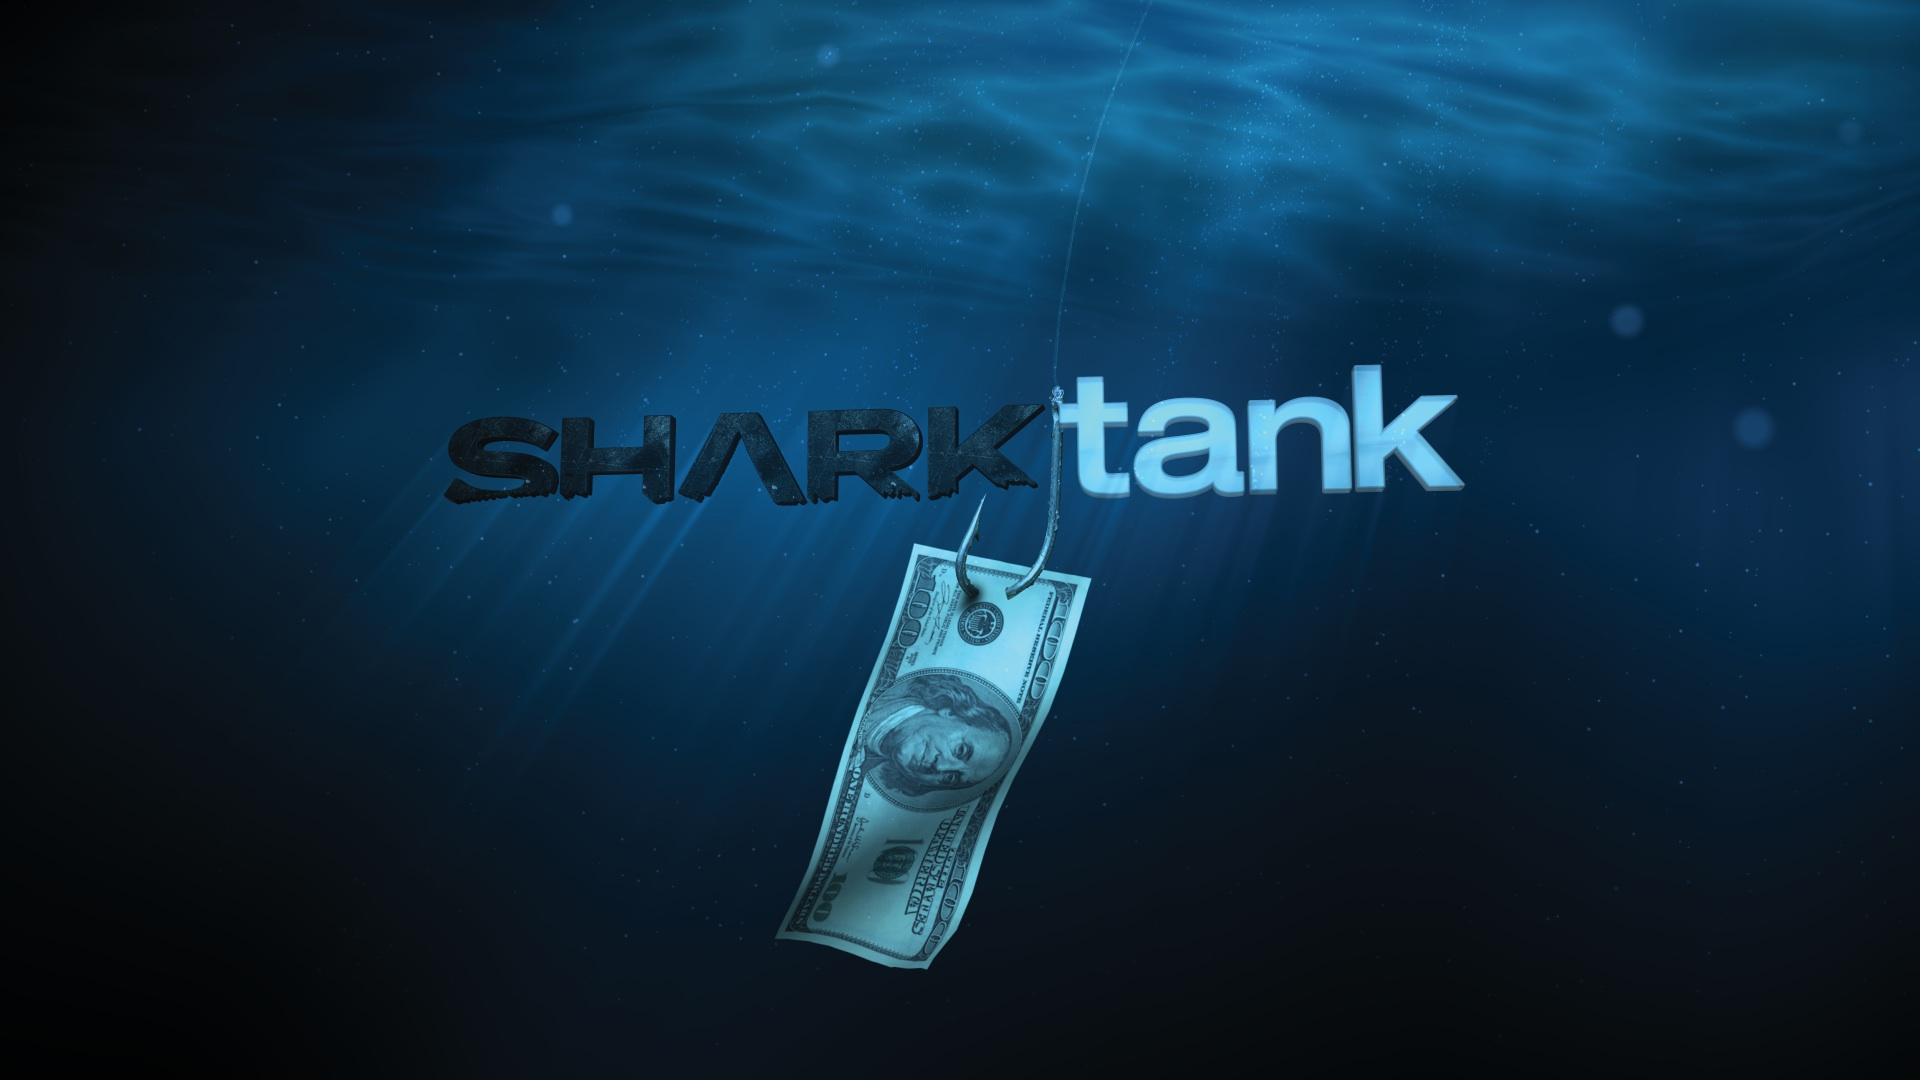 Iphone 7 Fish Wallpaper Hd Shark Tank Hd Wallpaper Background Image 1920x1080